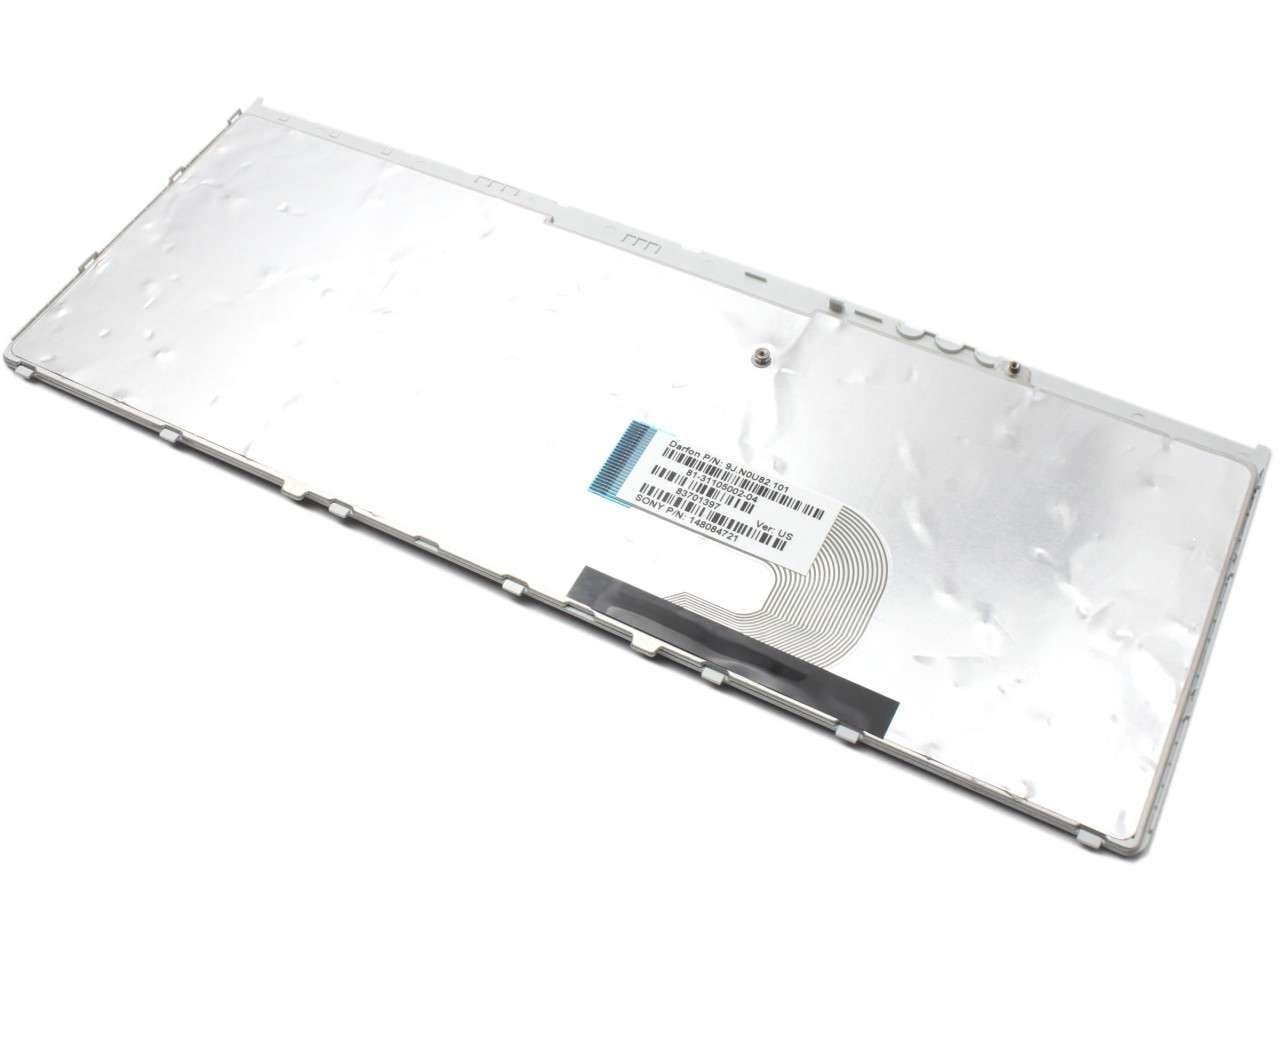 Tastatura Sony Vaio VGN-FW91NS neagra cu rama gri imagine powerlaptop.ro 2021